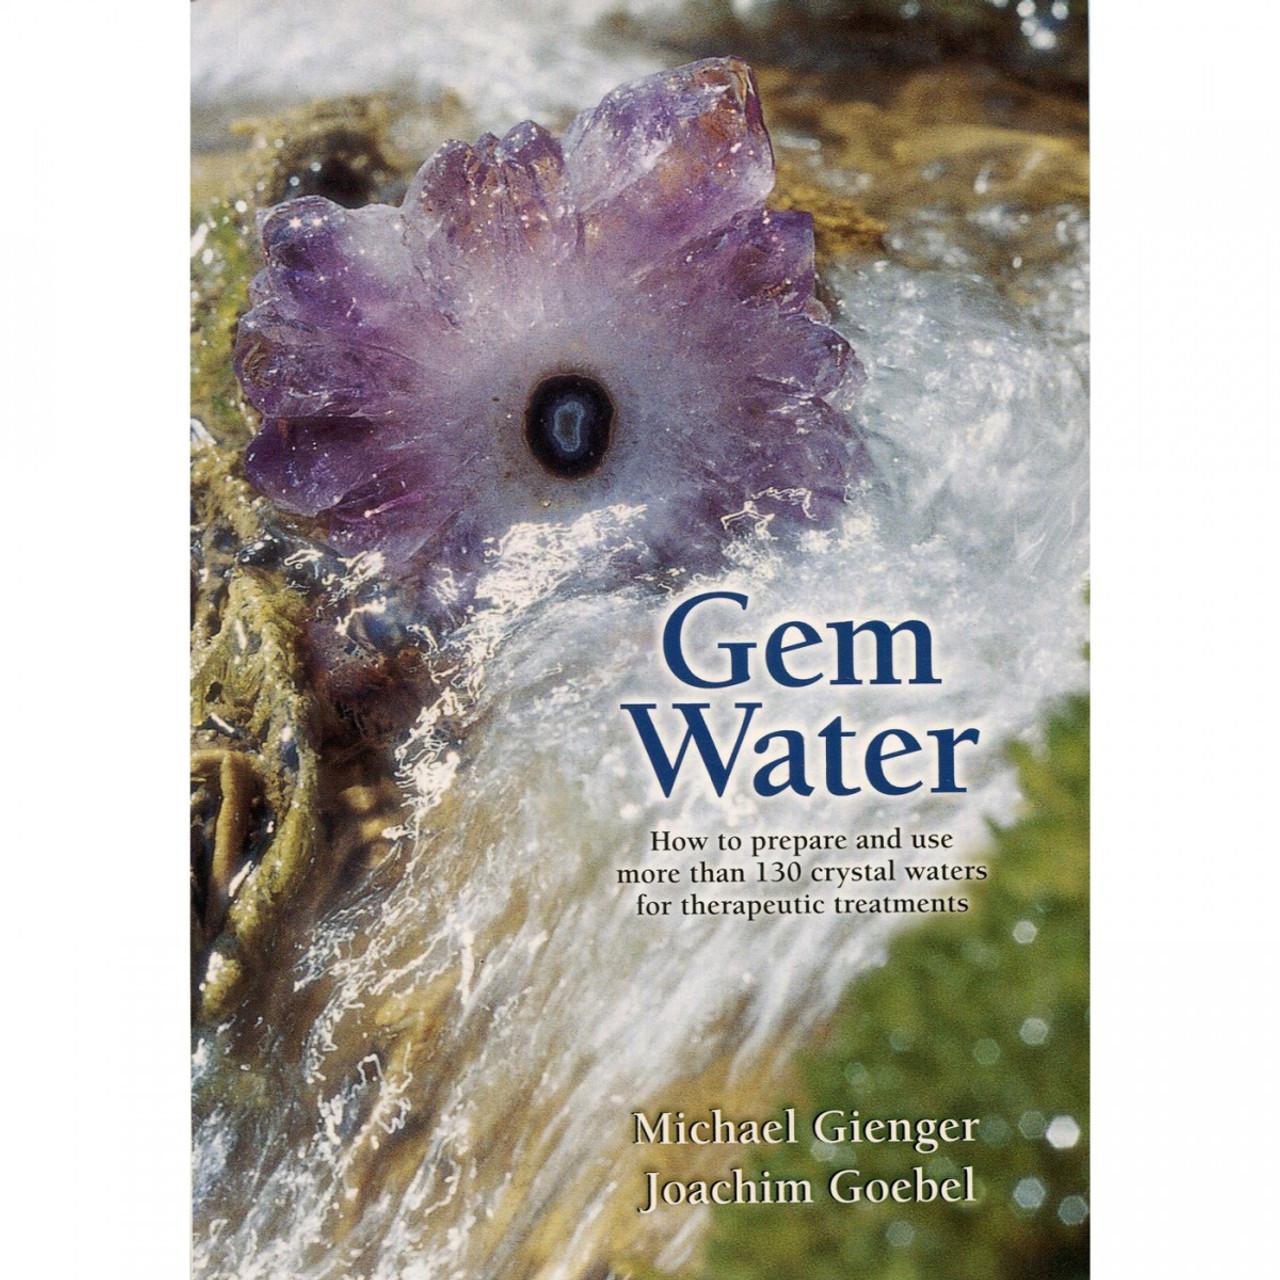 Gem Water by Michael Gienger